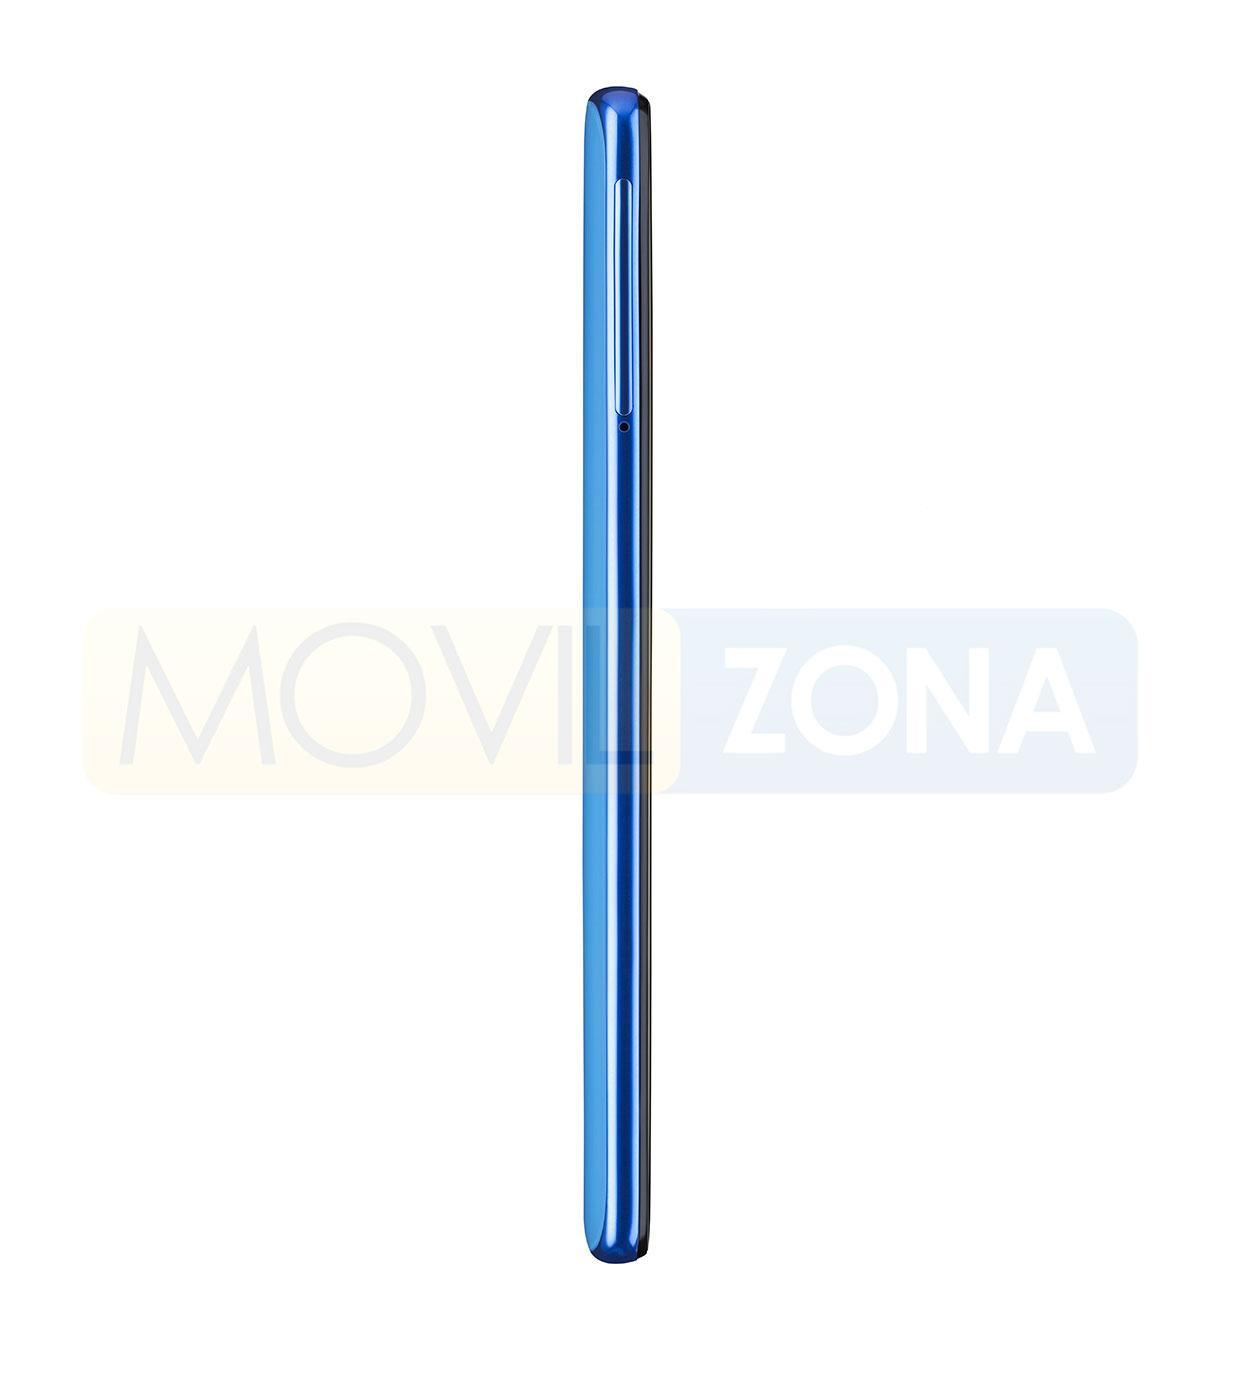 Samsung Galaxy A40 perfil 1